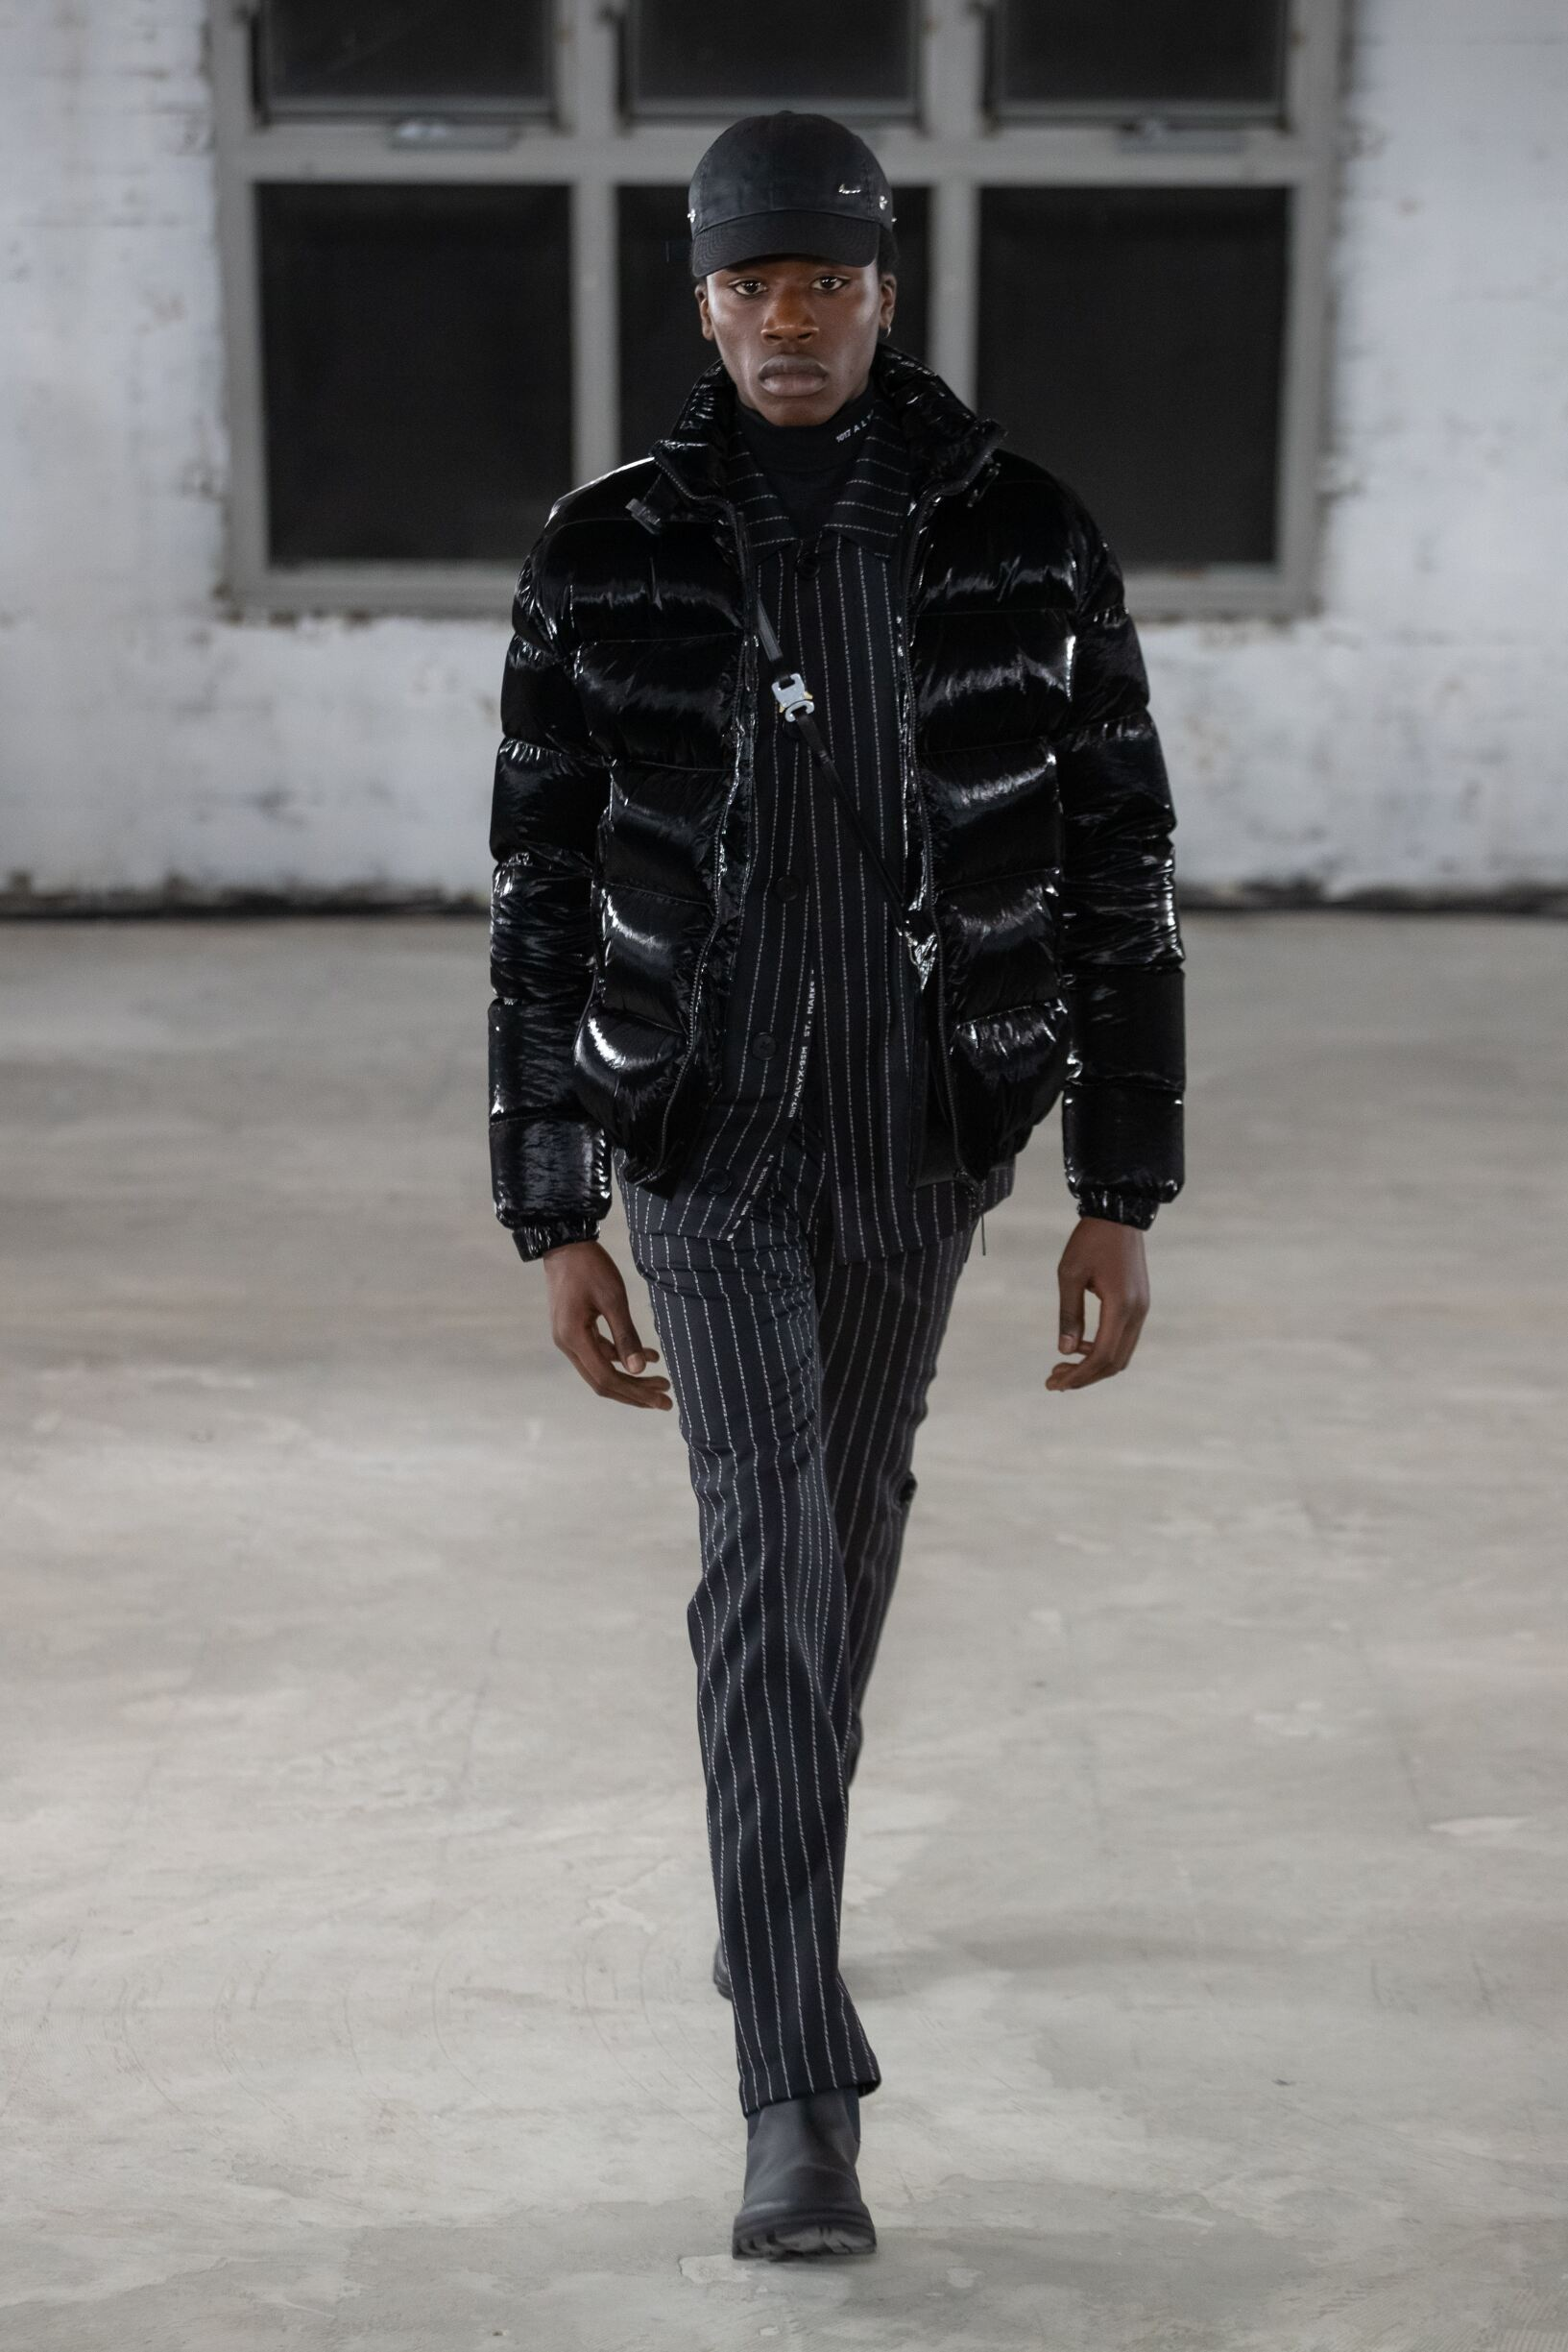 Winter 2019 Man Trends ALYX